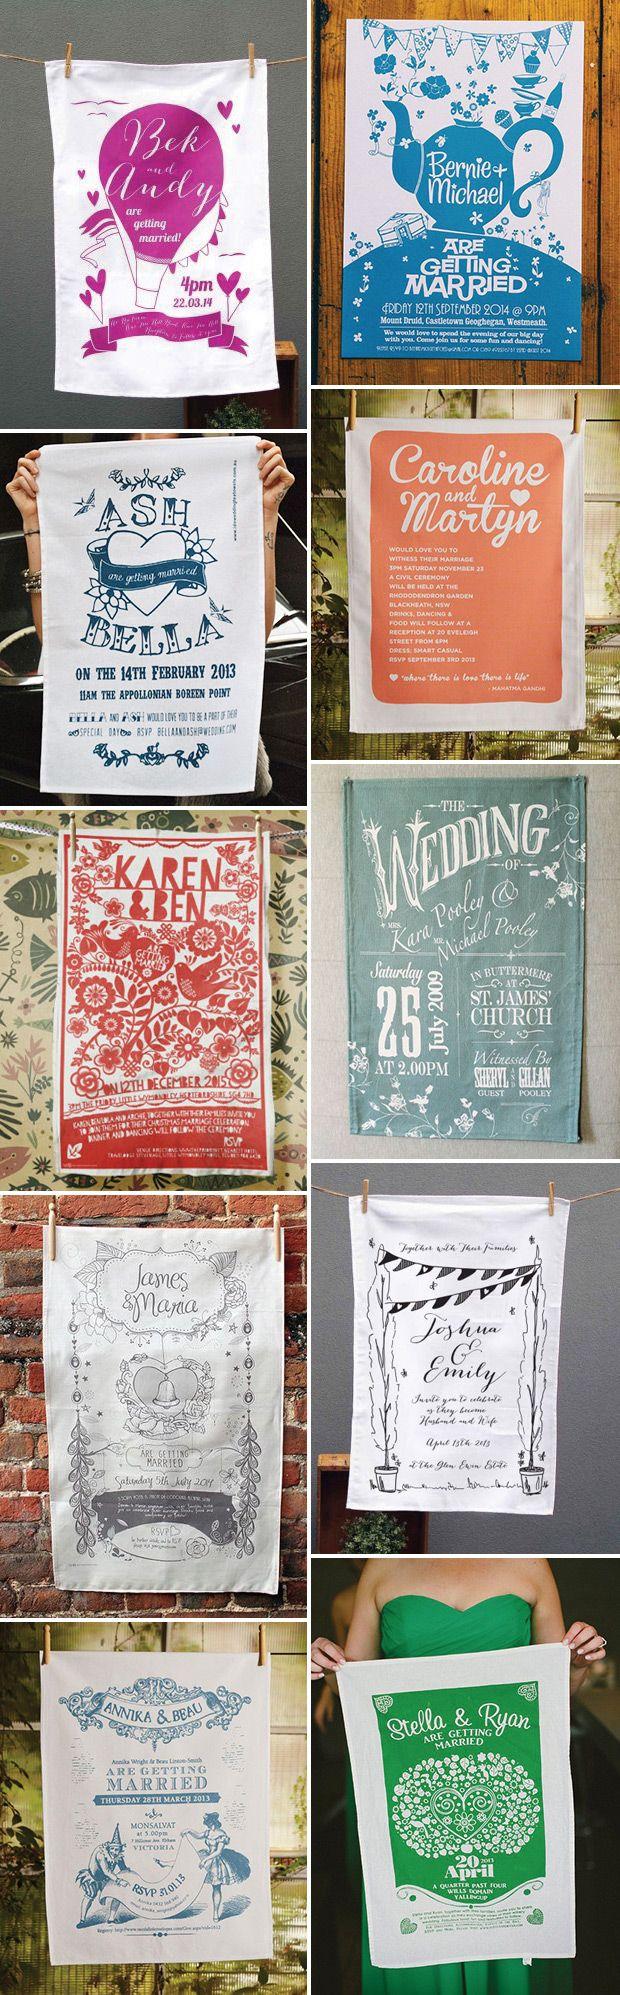 Wedding Invitation Ideas - Wedding Tea Towels - onefabday.com